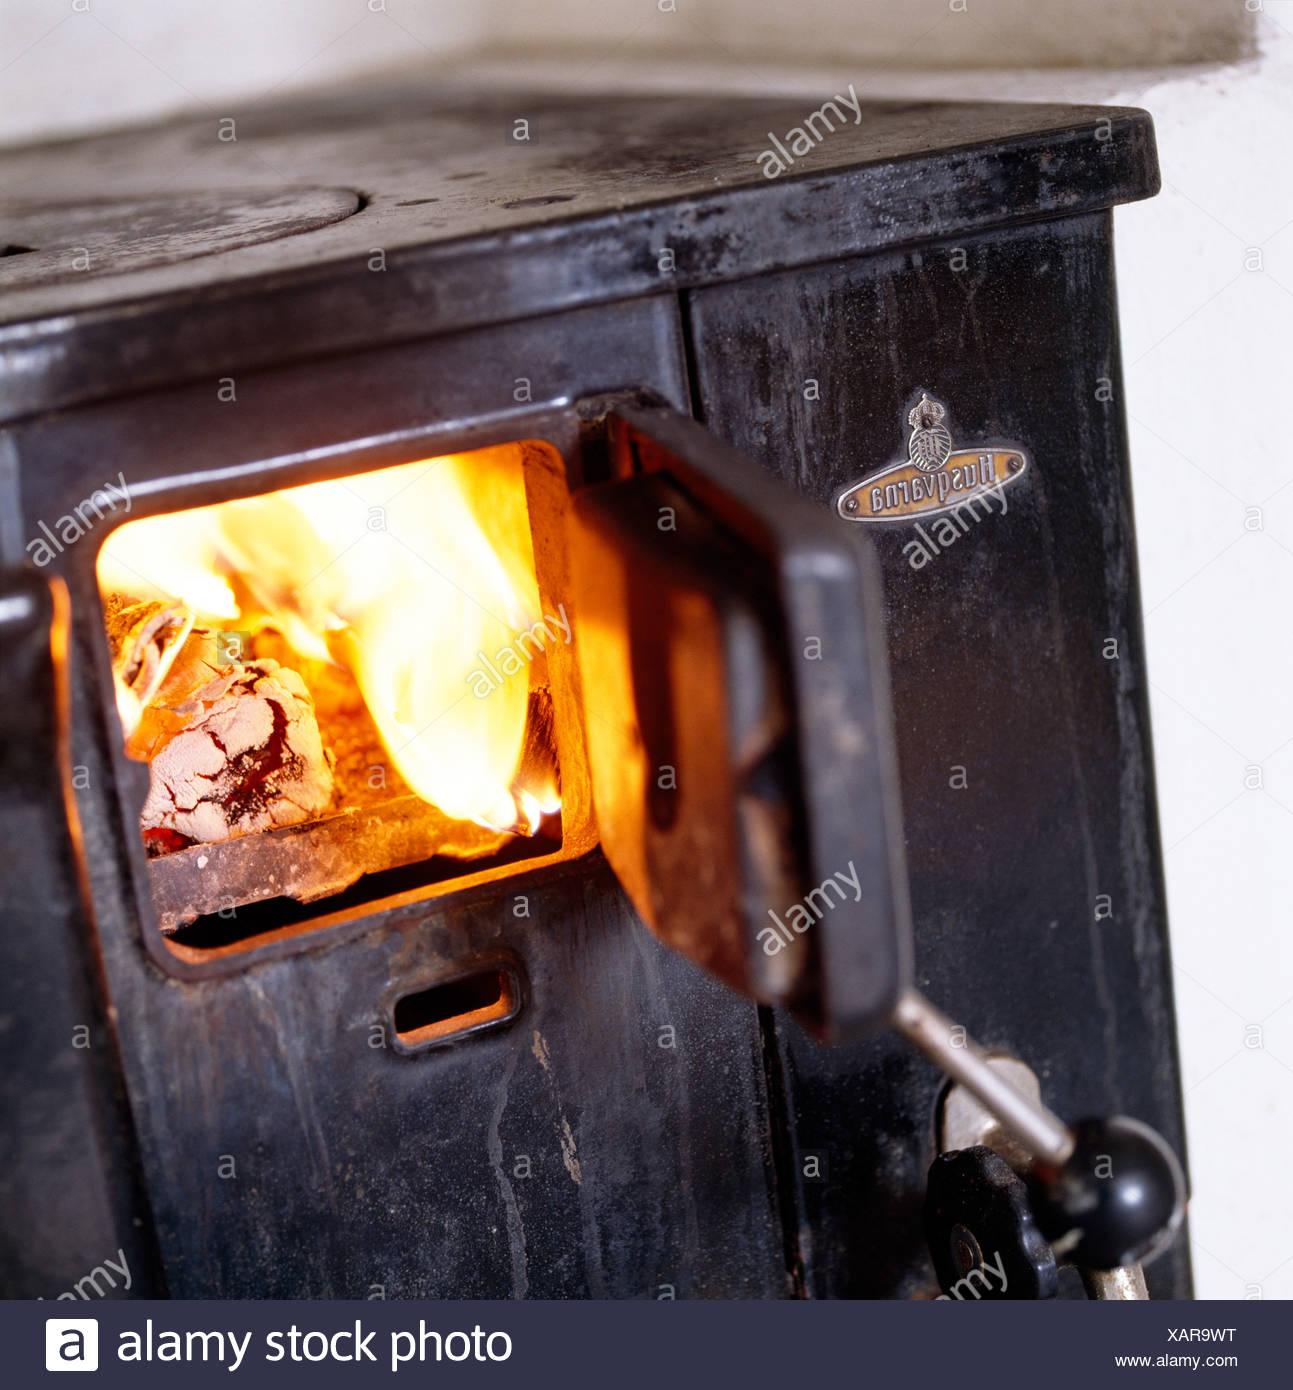 Old wood stove. Stock Photo